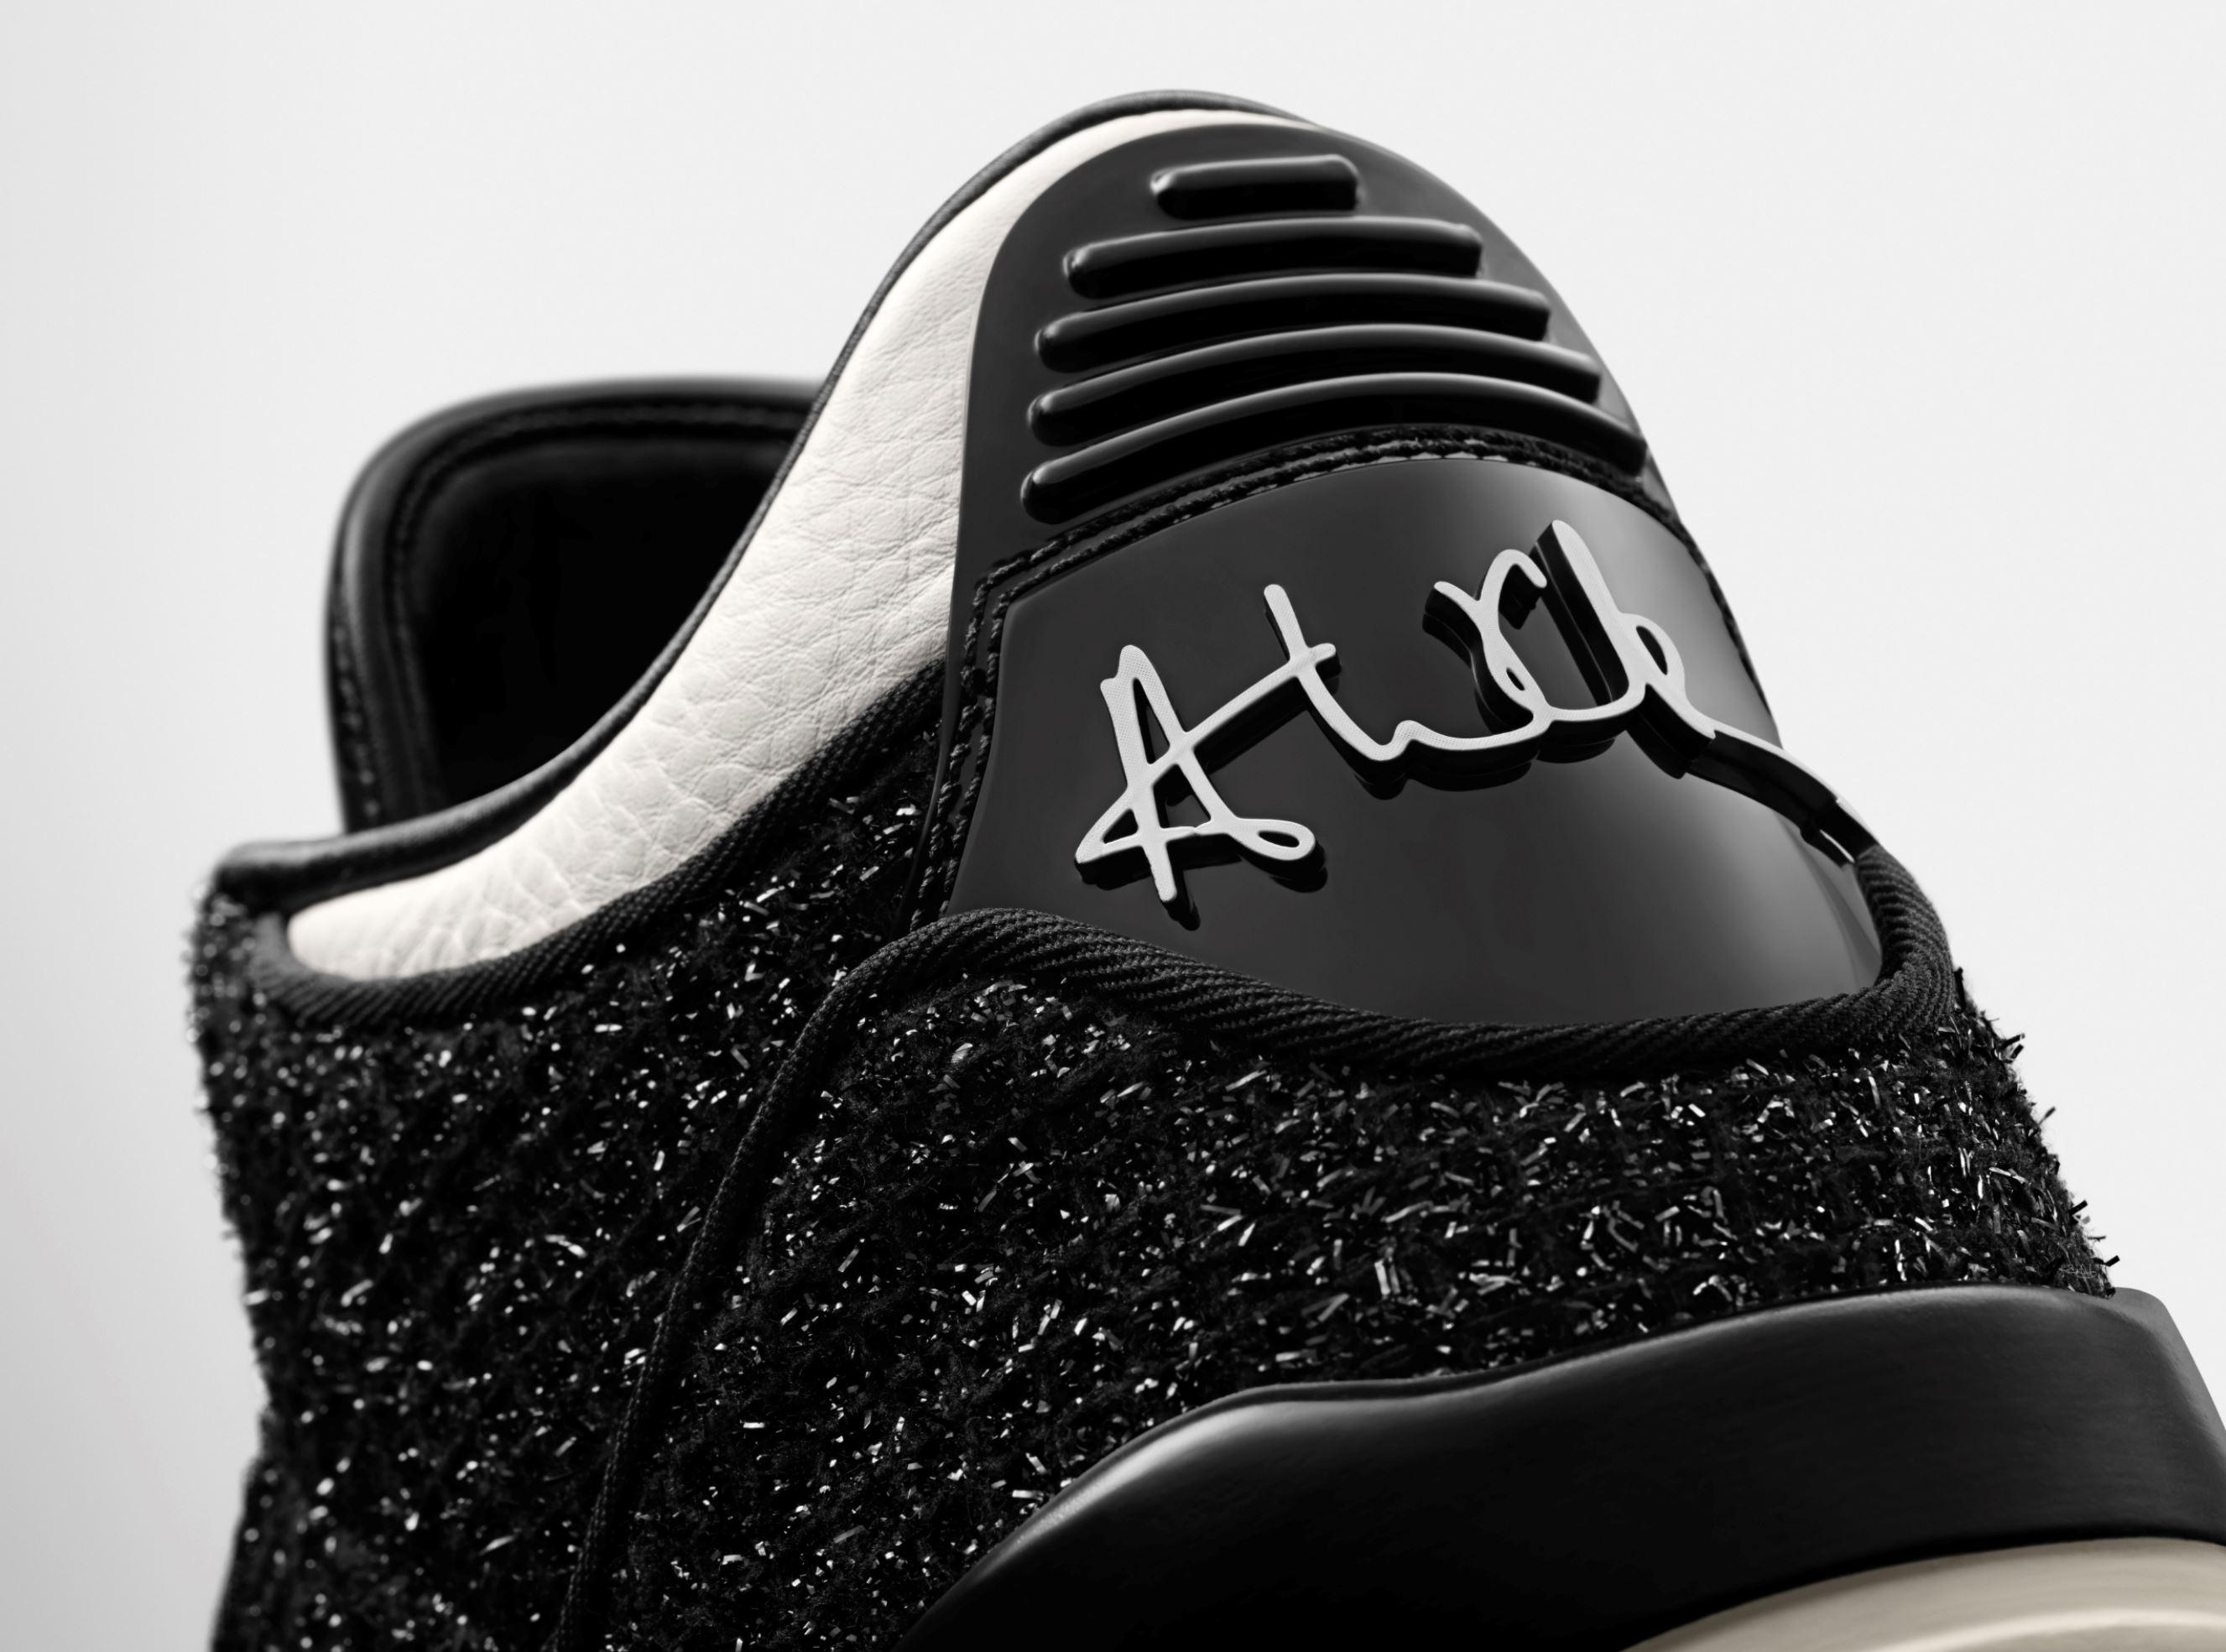 Vogue air jordan 3 SE AWOK black - WearTesters 68032bea2